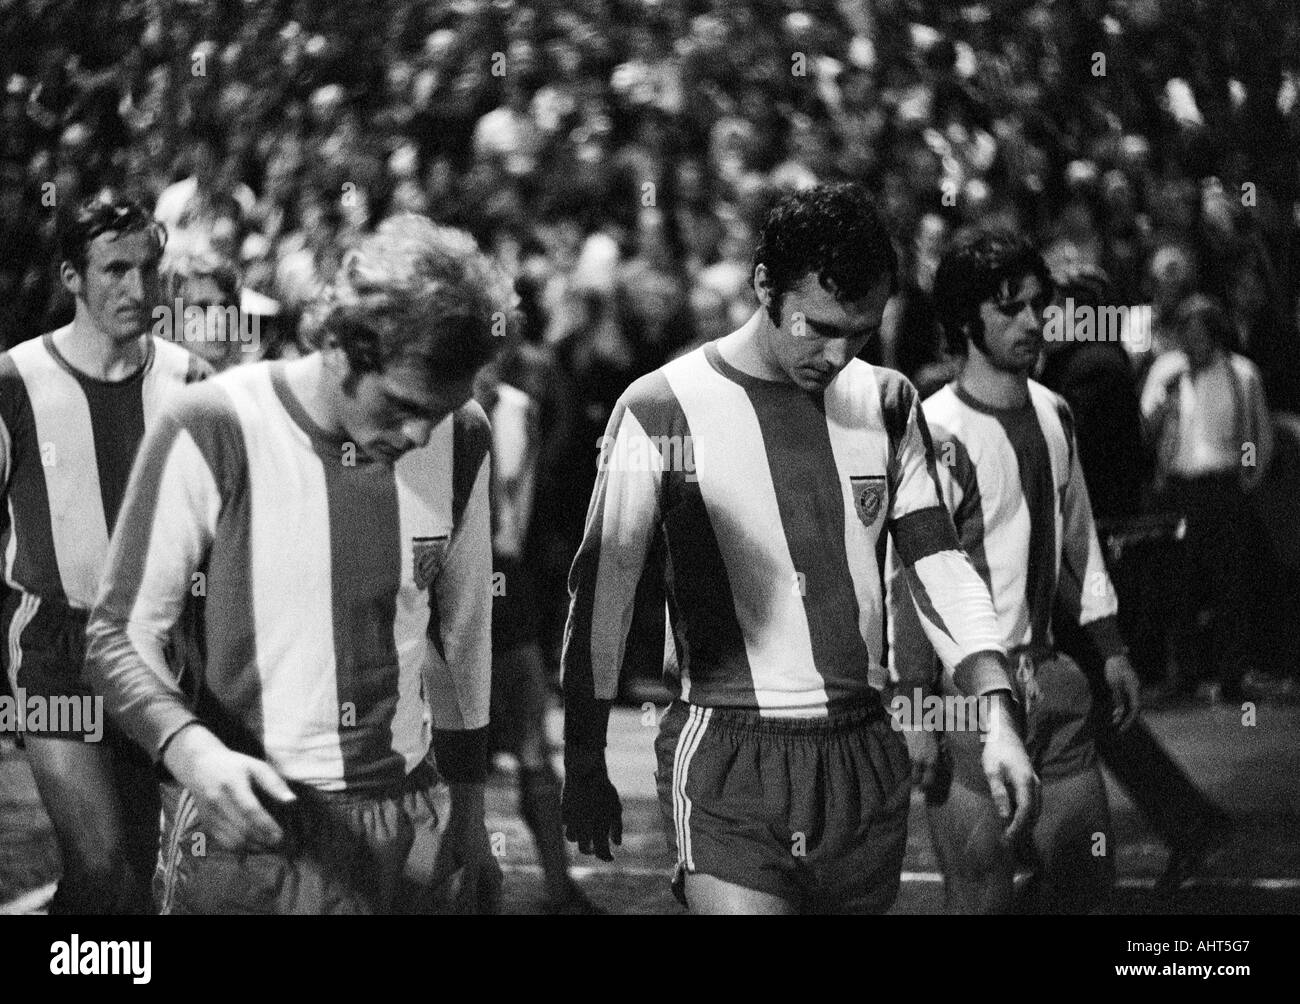 football, Bundesliga, 1970/1971, Boekelberg Stadium in Moenchengladbach, Borussia Moenchengladbach versus FC Bayern Munich 3:1, football players coming in, f.l.t.r. Georg Schwarzenbeck, Ulrich Hoeness, Franz Beckenbauer, Gerd Mueller (all FCB) - Stock Image